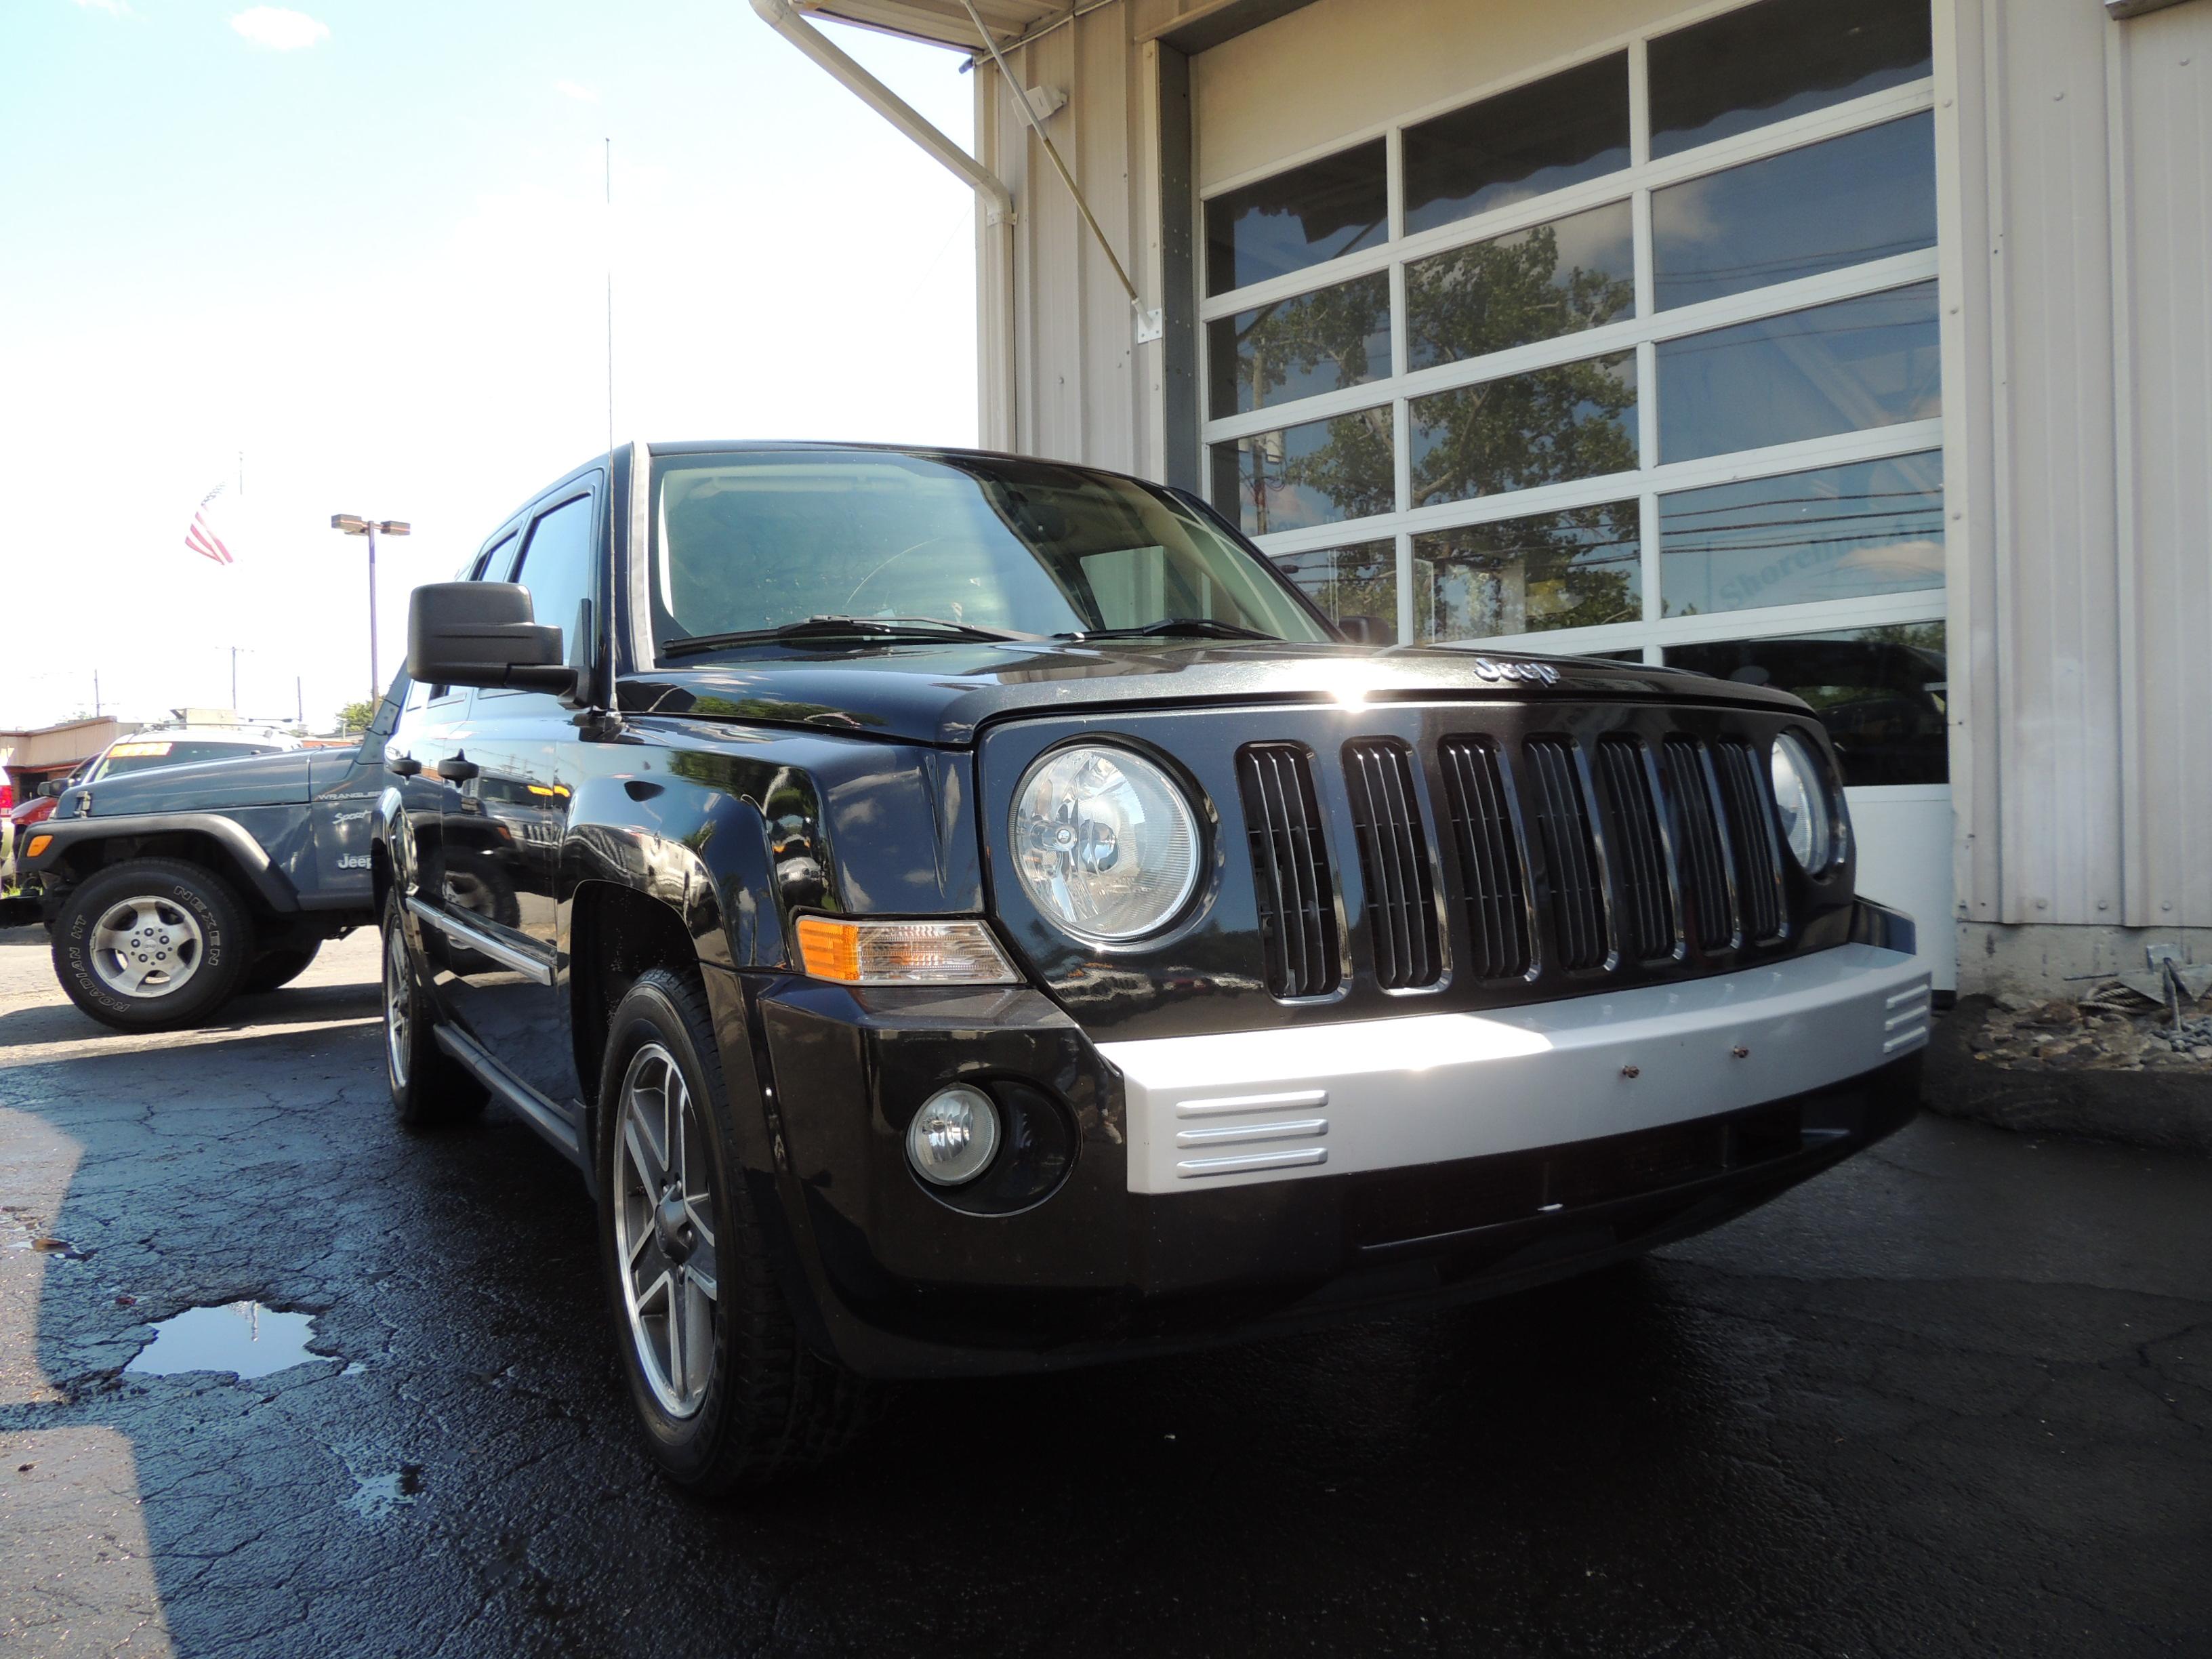 Jeeps For Sale In Ct >> 2008 Jeep Patriot Limited Edition   Shoreline Auto Sales